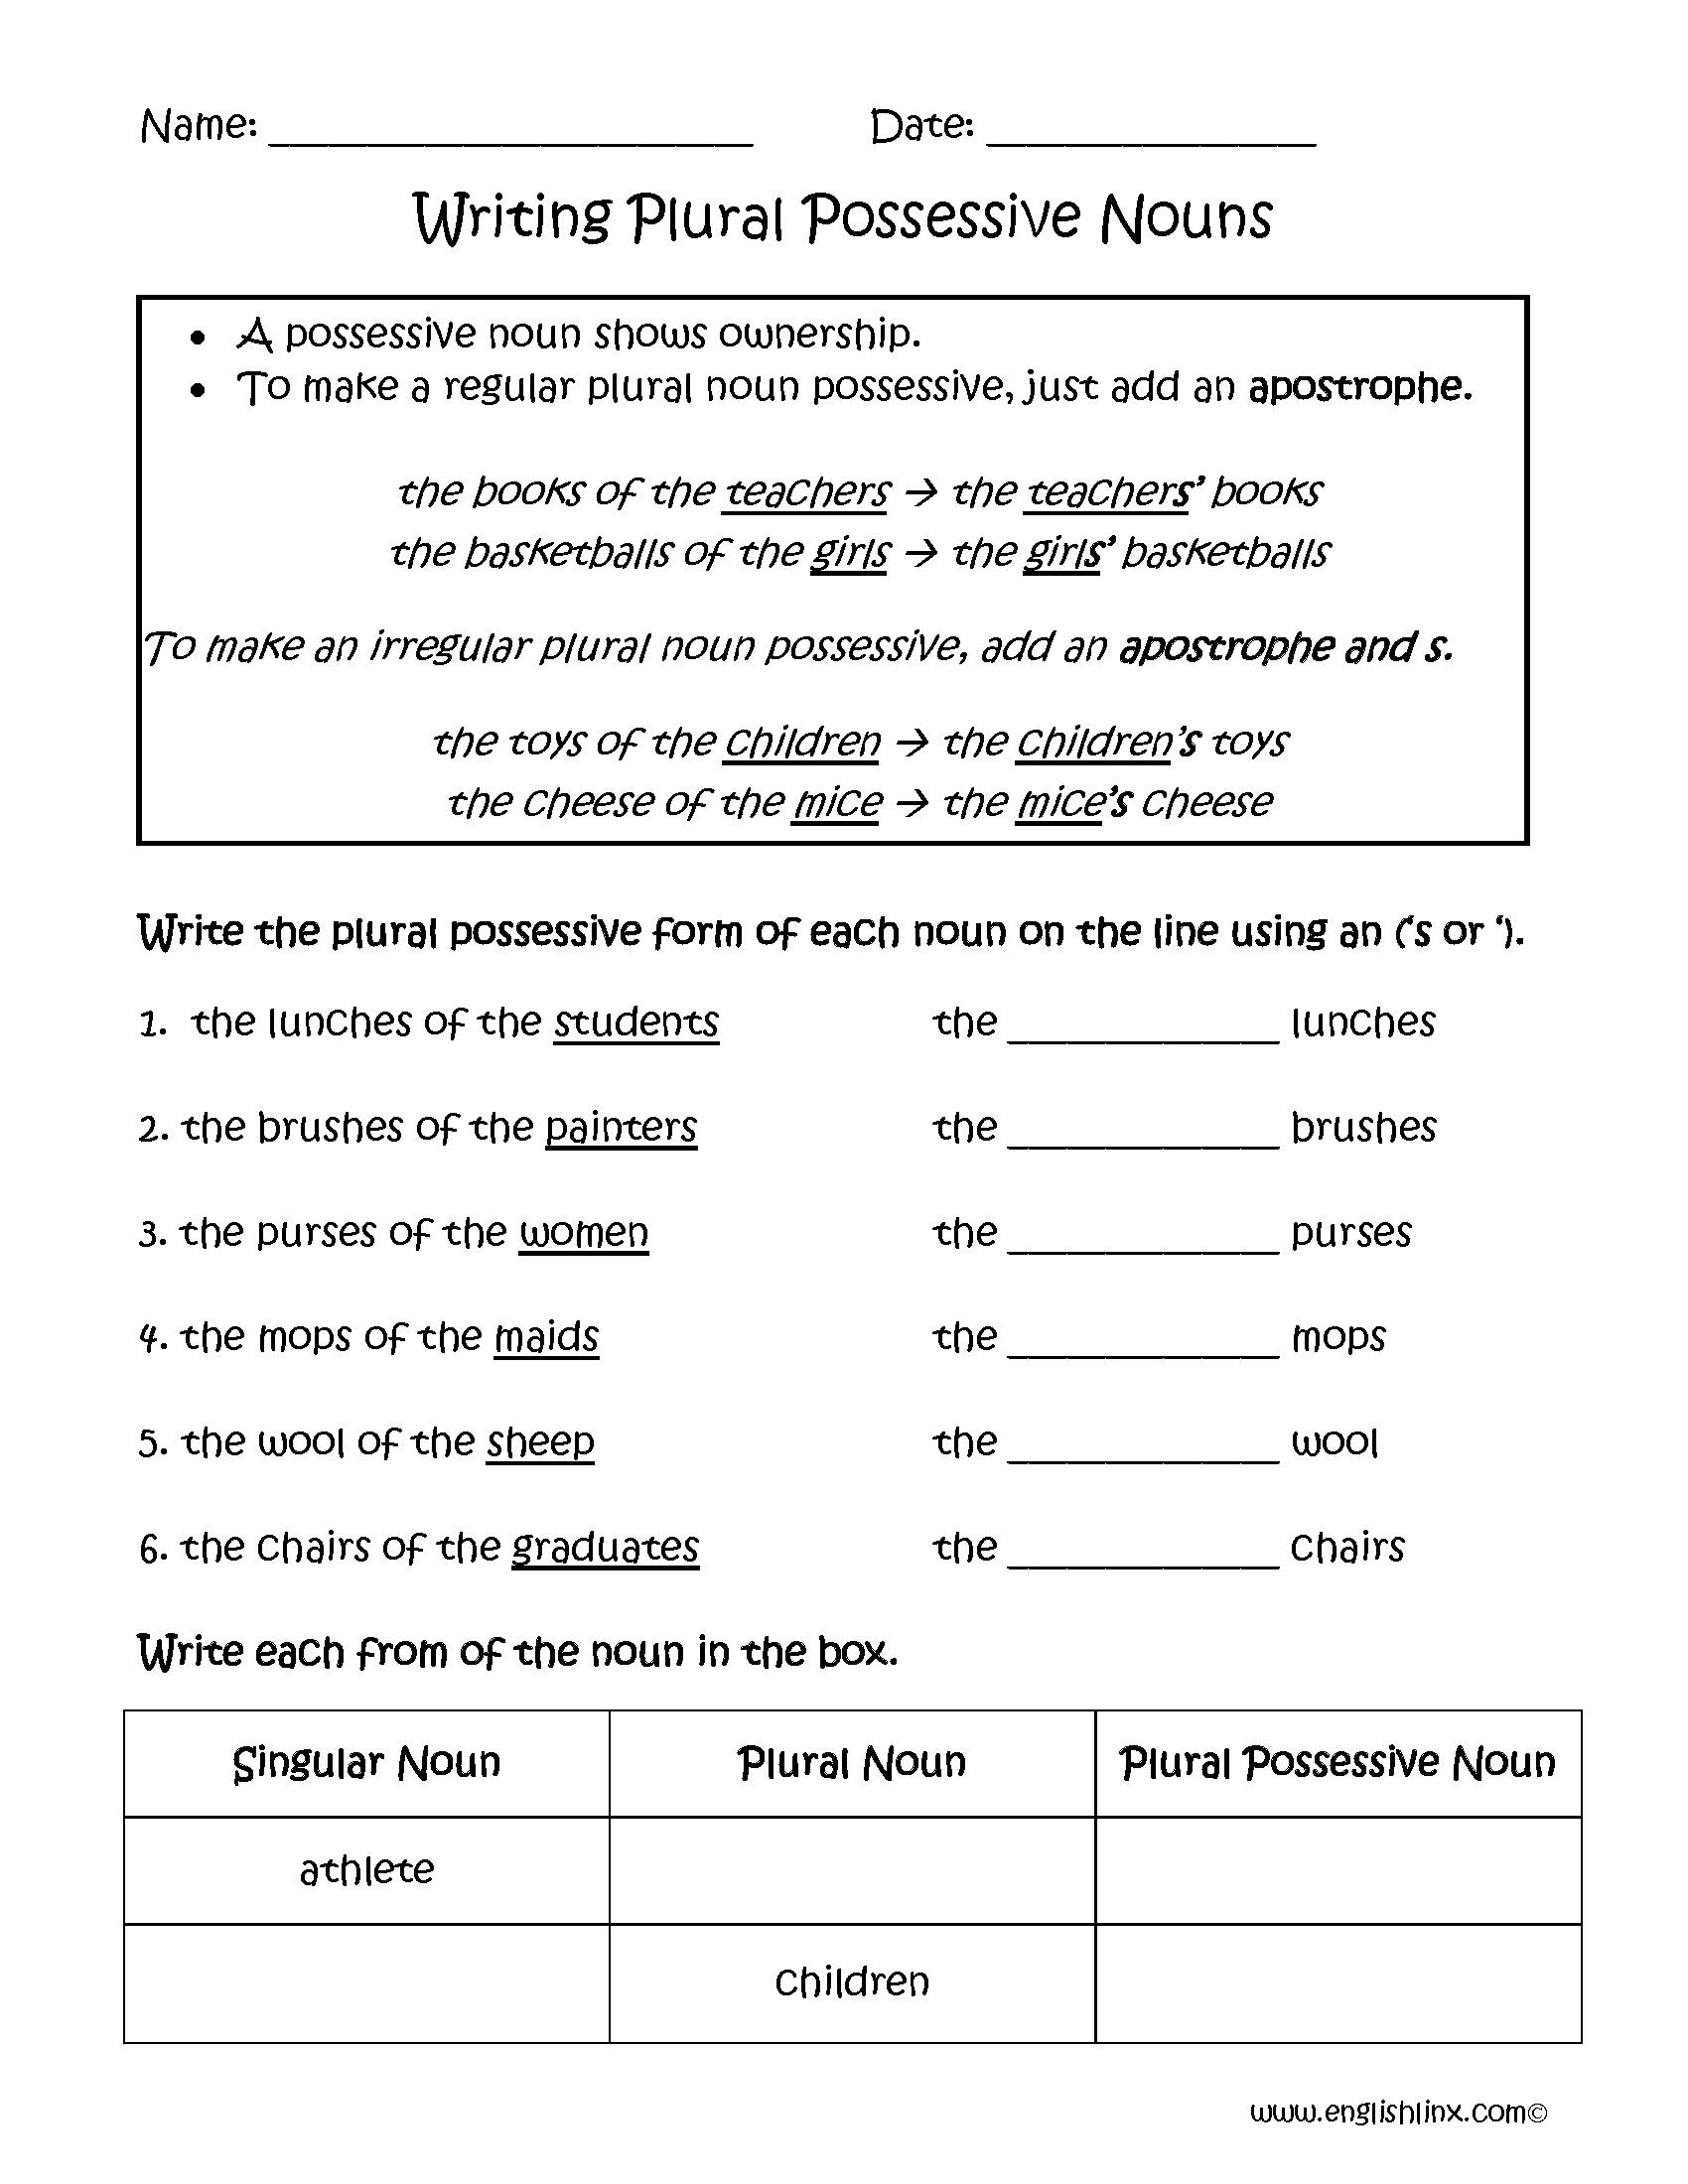 Plural Or Possessive Noun Worksheet The Best Worksheets Image